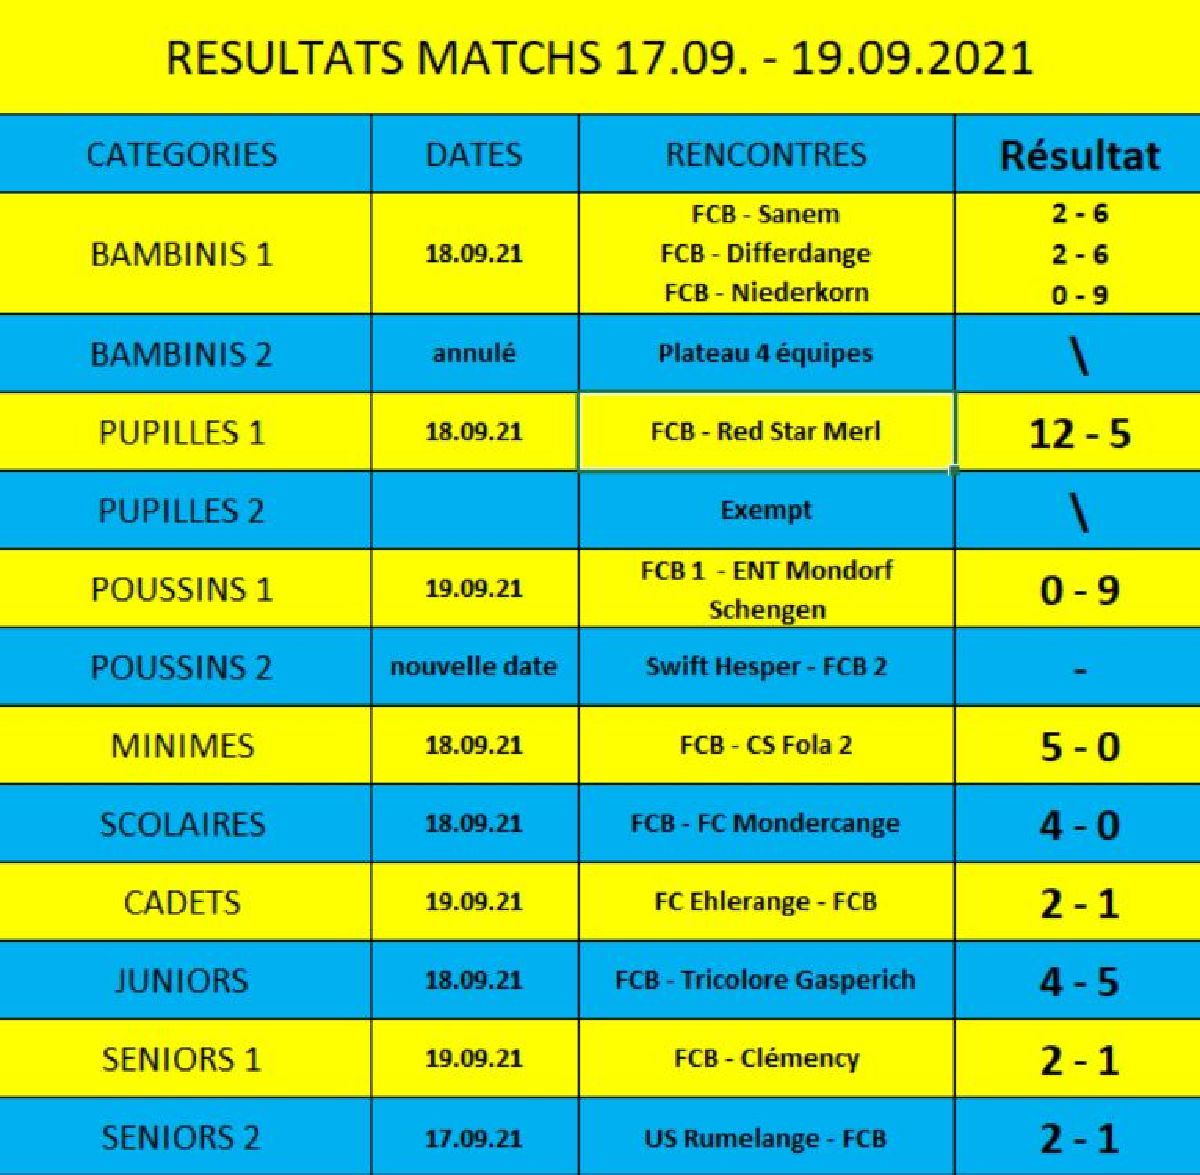 Résultats du weekend 17.09. - 19.09.2021